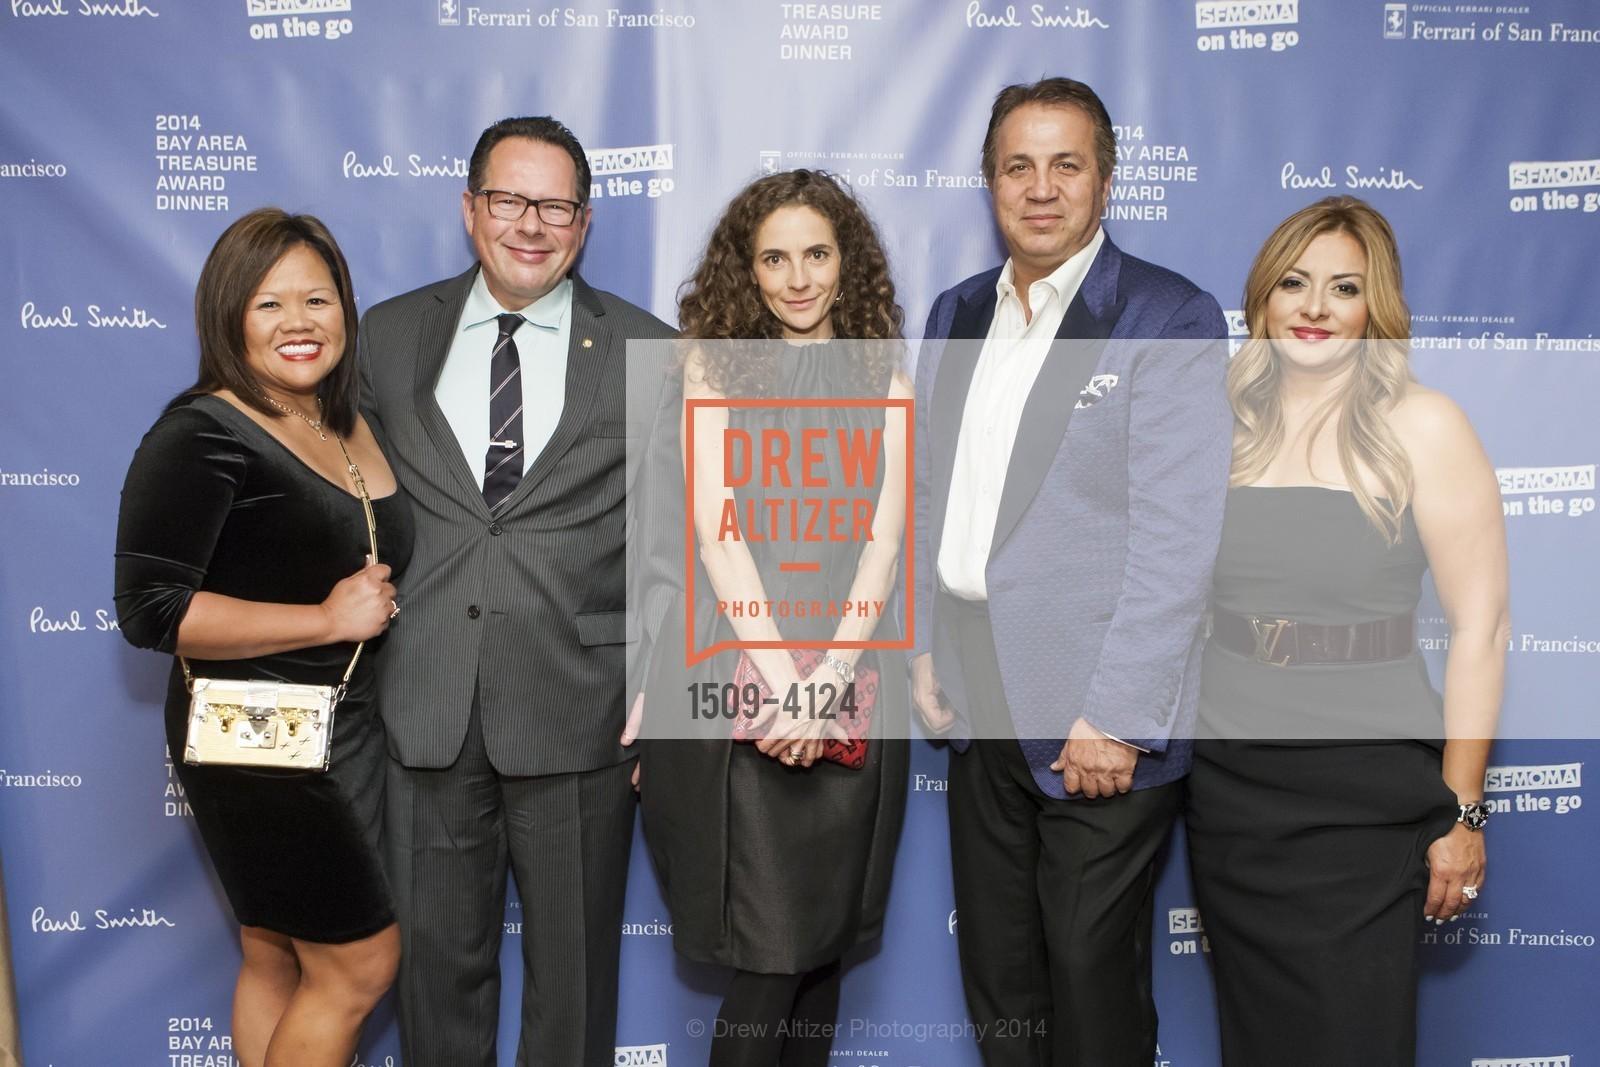 Camille Anderson, Scott Anderson, Monica Savini, Ed Baalbaki, Susan Dahi, Photo #1509-4124